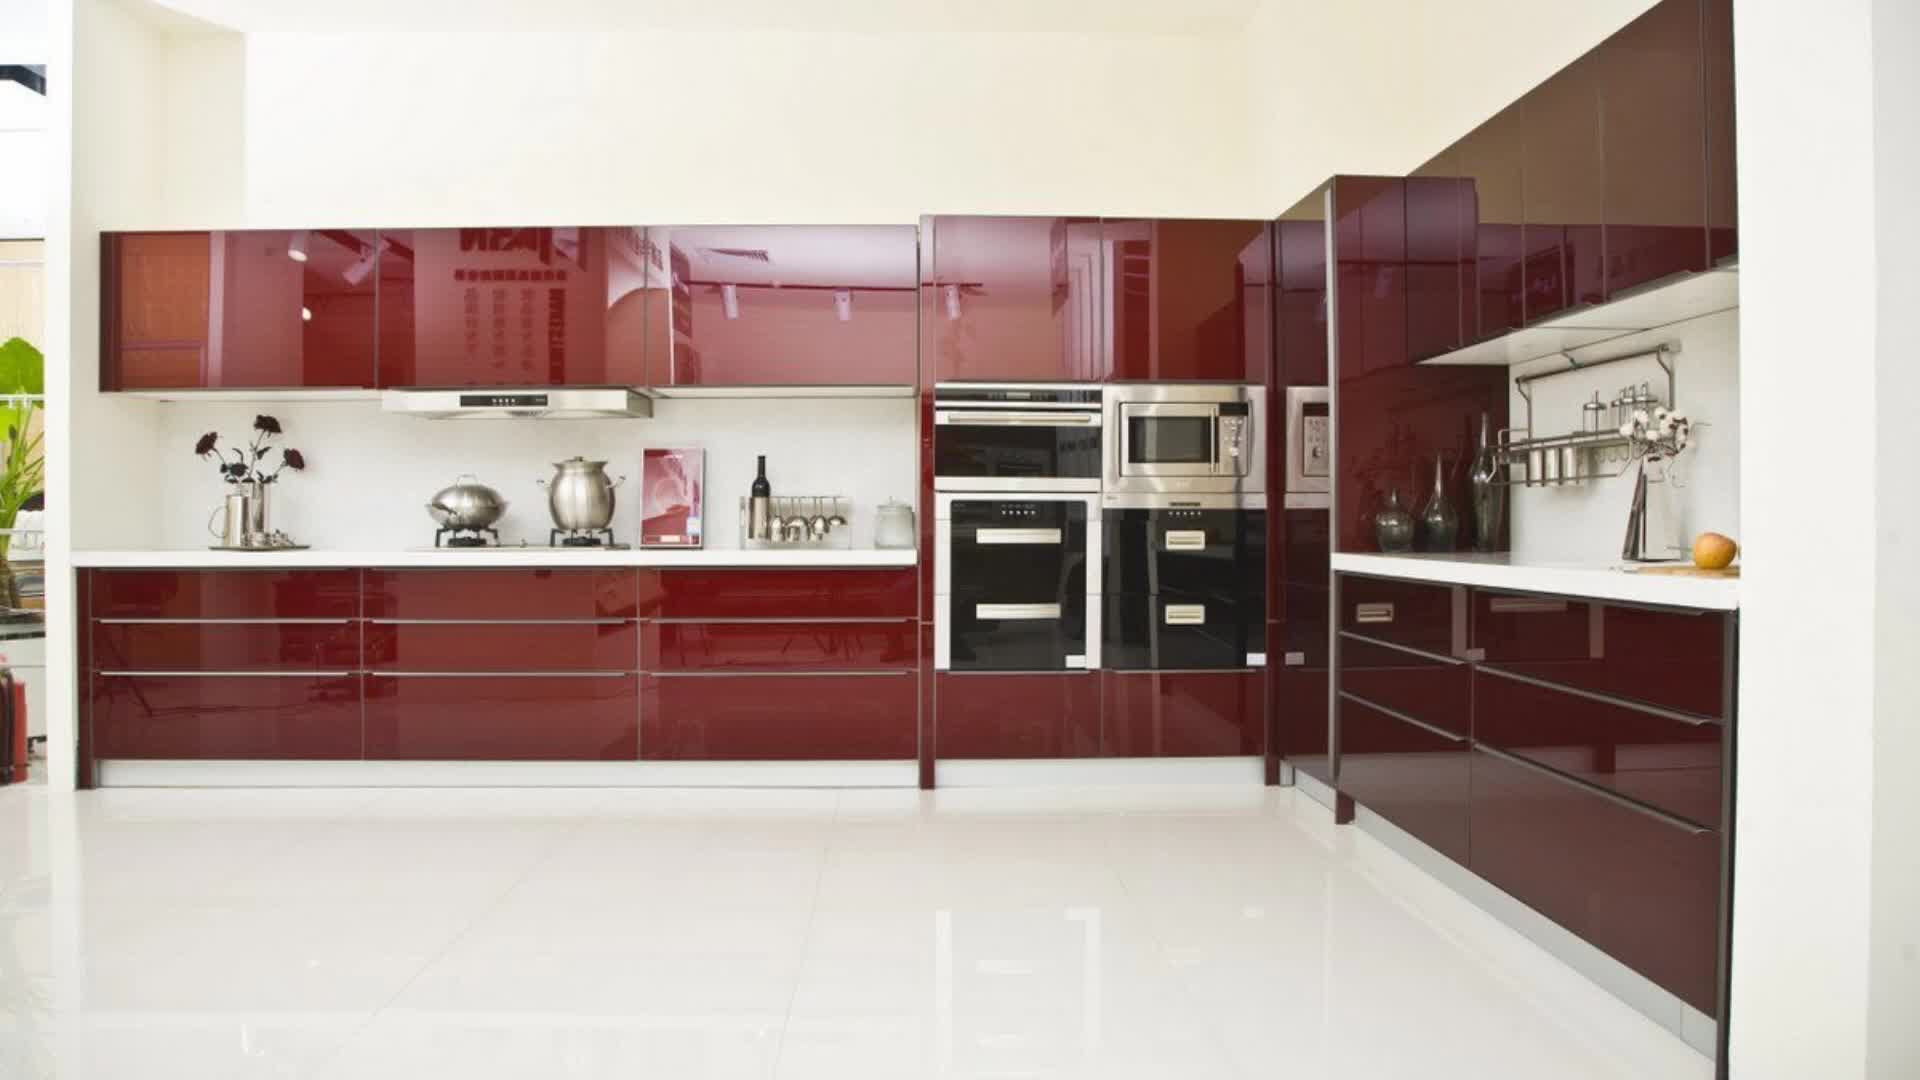 Mutfak seti İtalyan Modern Mutfak Tasarım